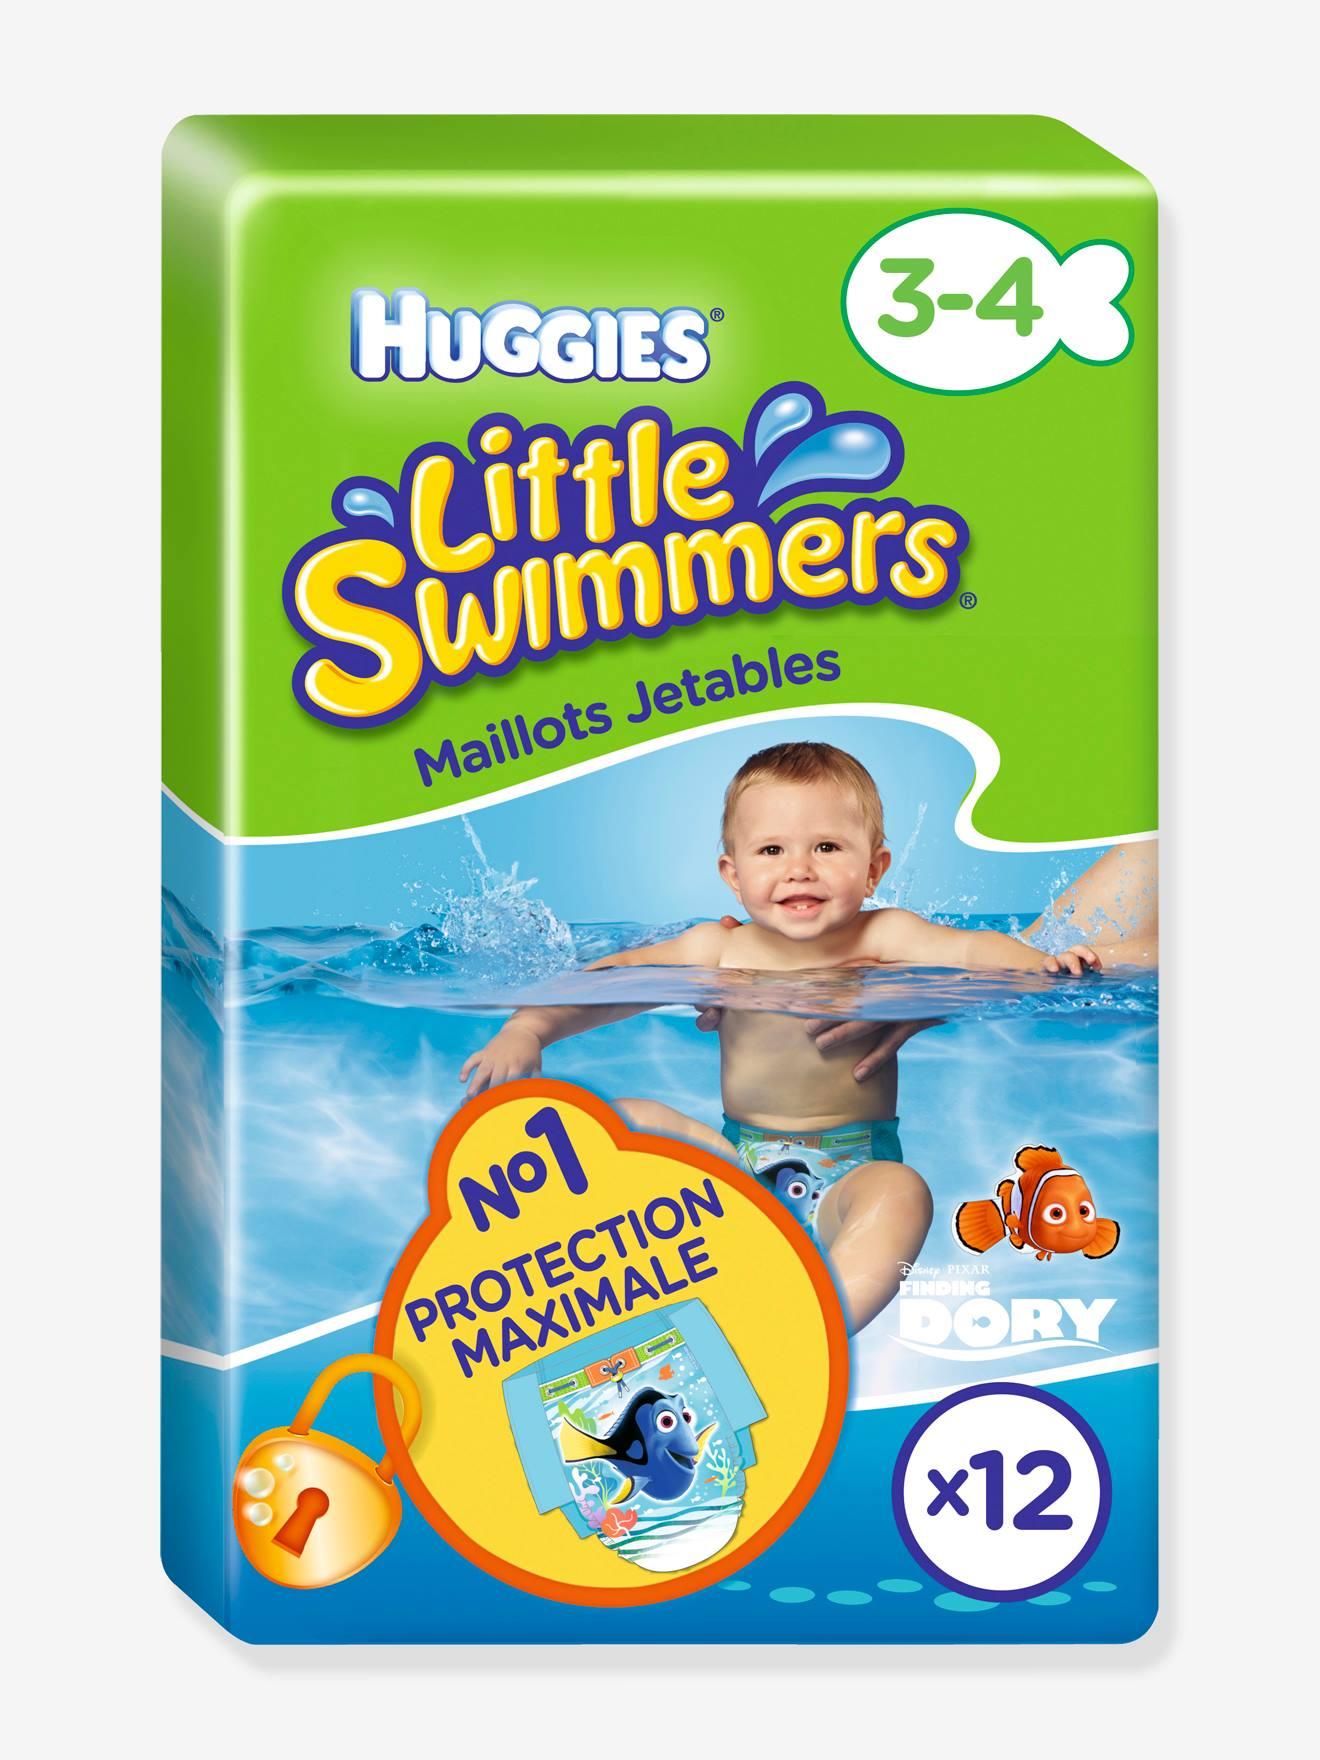 LITTLE SWIMMERS Pañal de piscina desechable HUGGIES Little Swimmers, talla 3-4, lote de 12 verde medio estampado